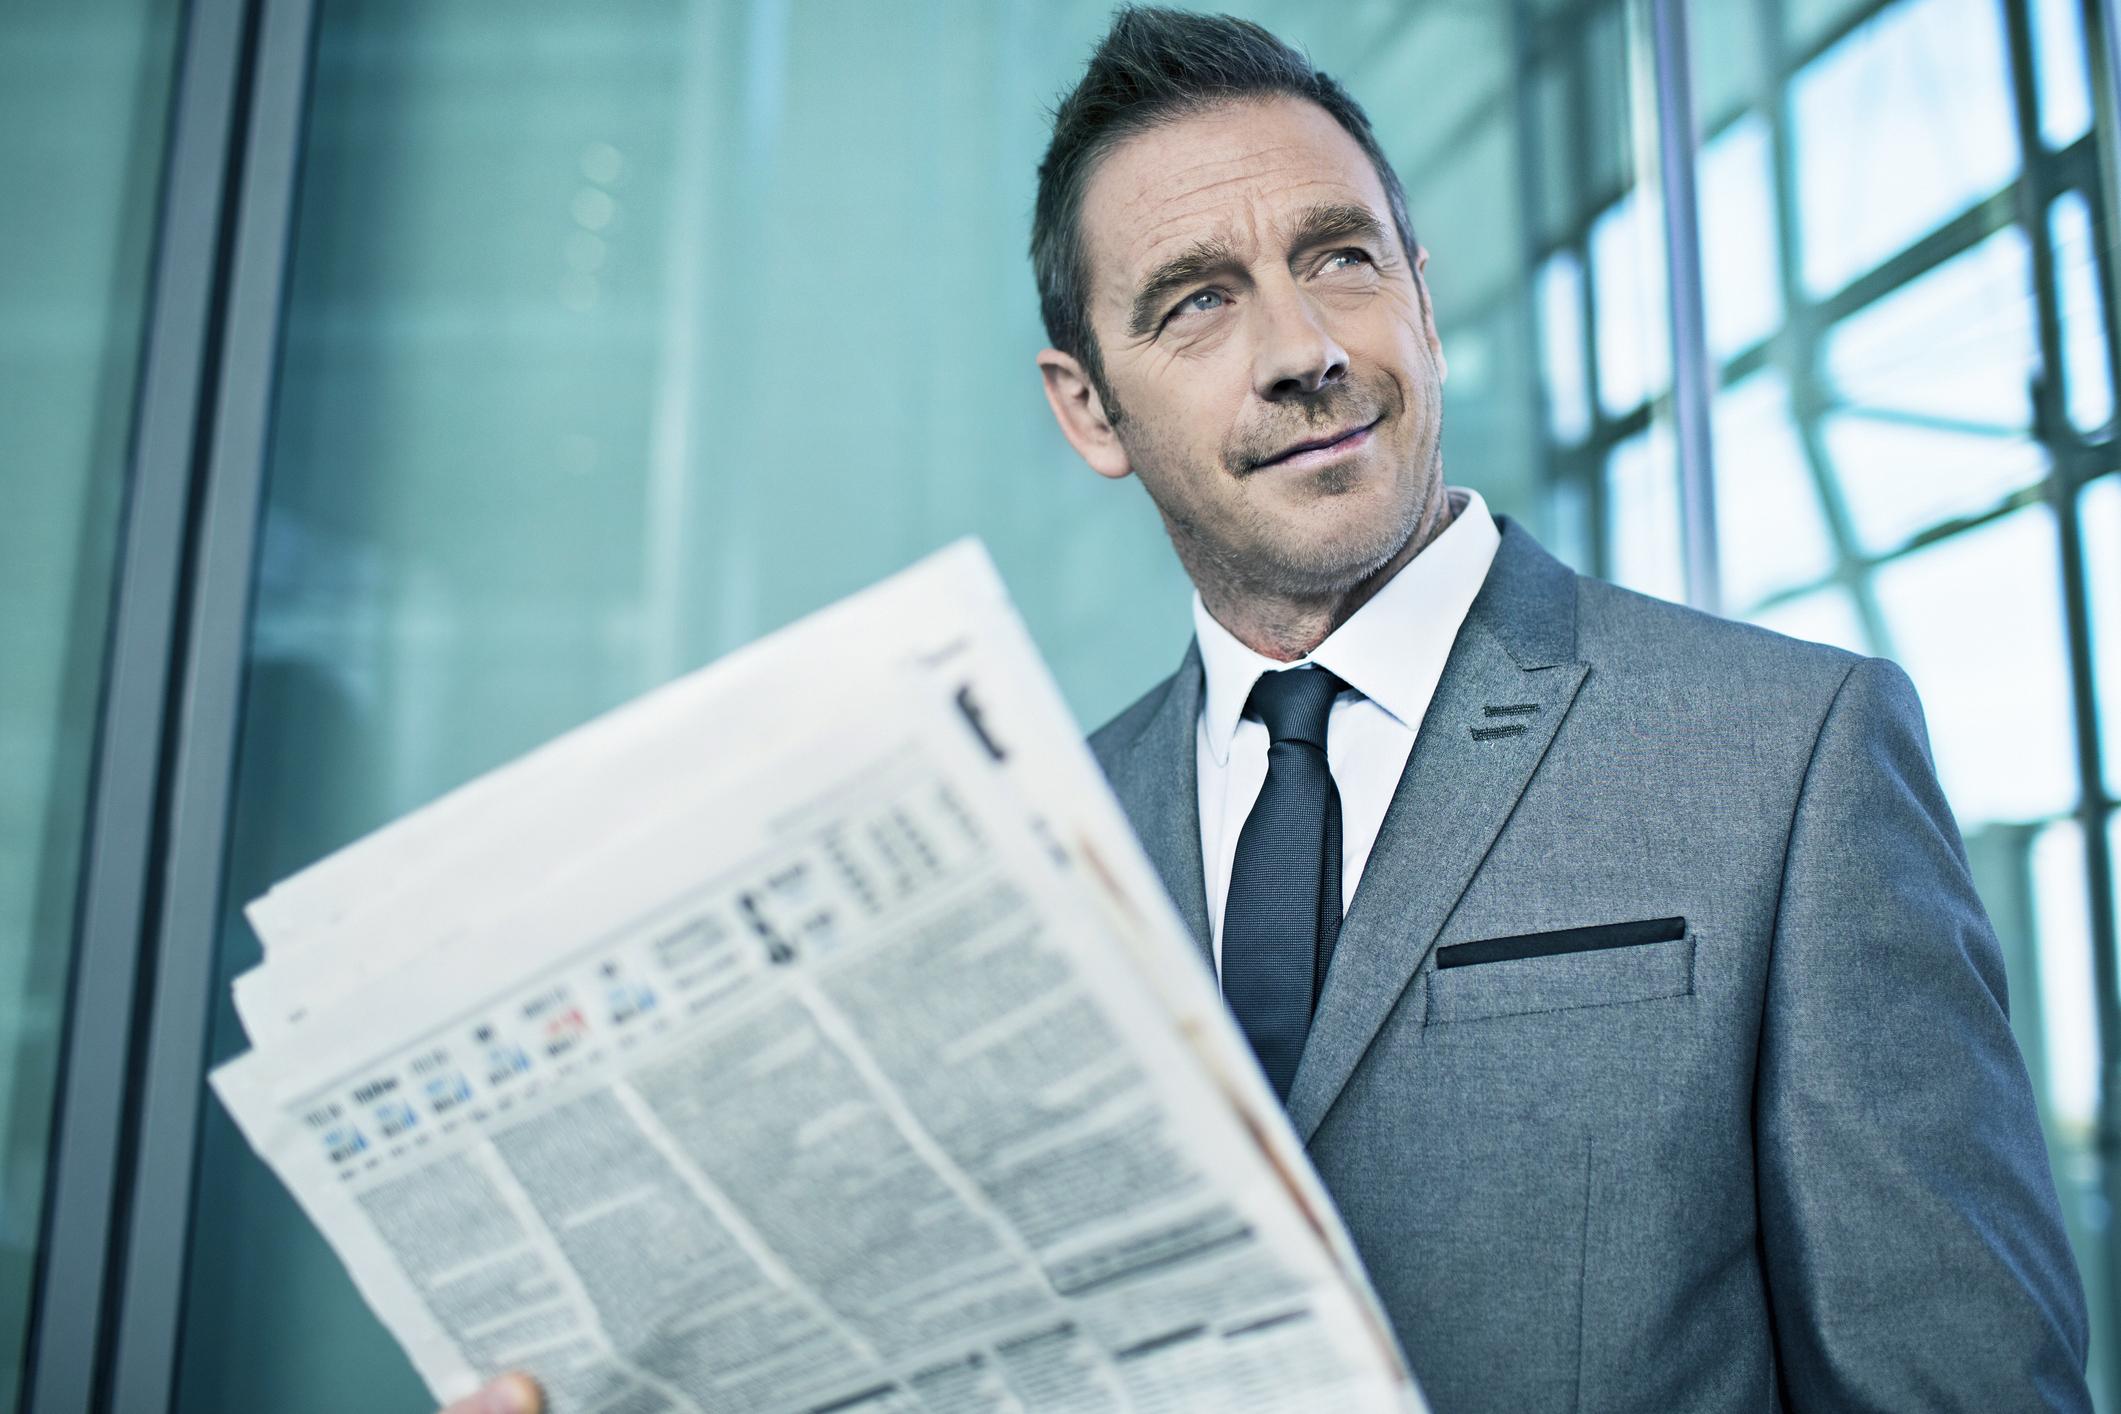 A smirking businessman reading a financial newspaper.